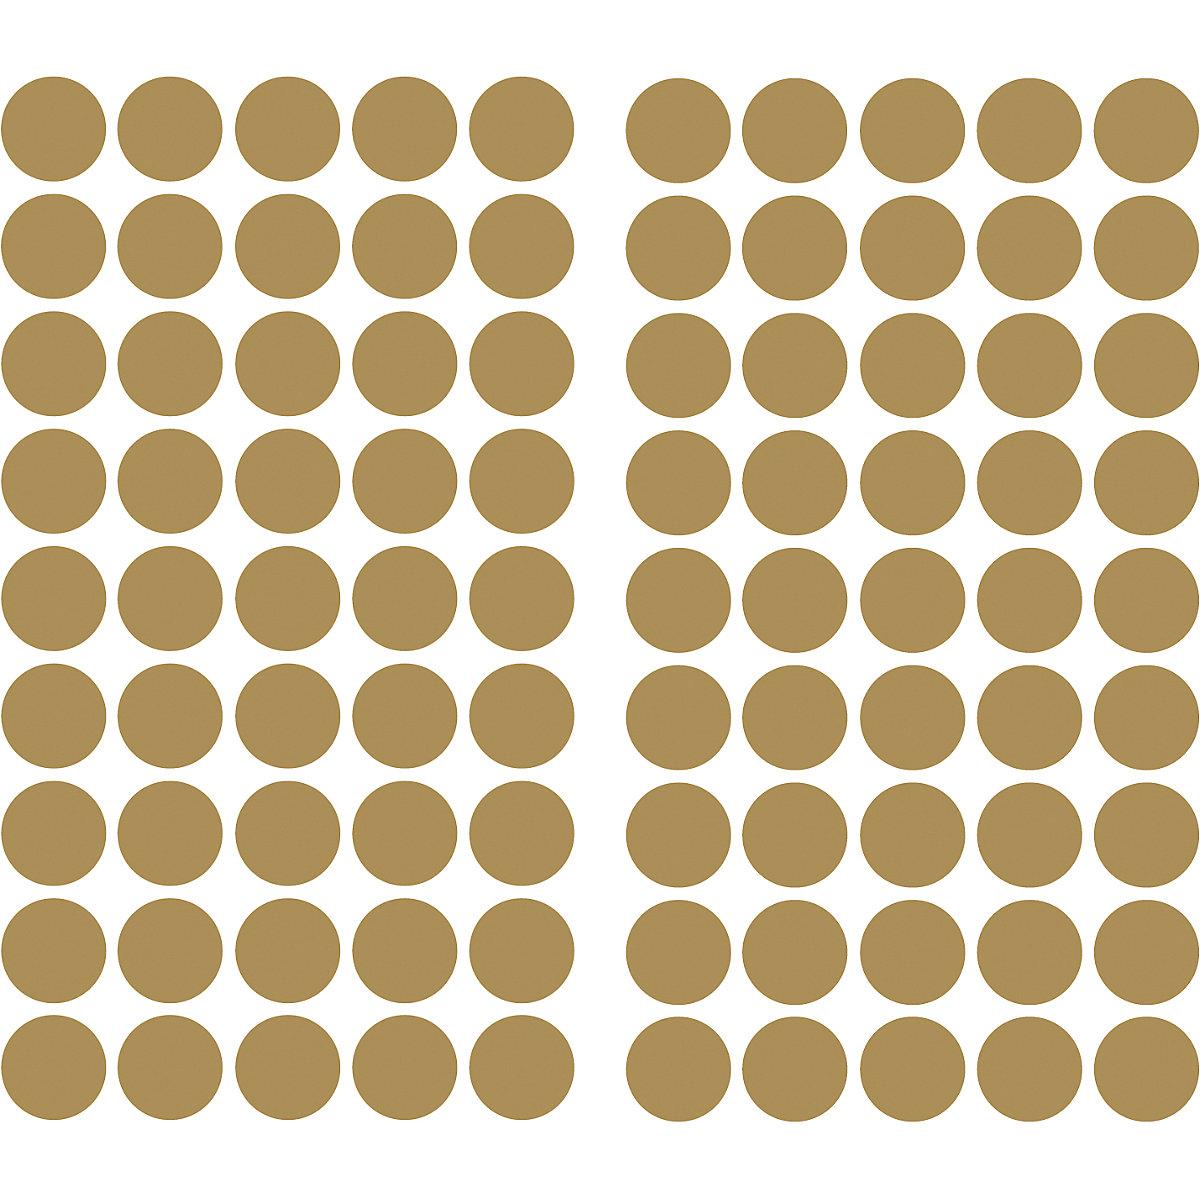 Wandsticker goldfarbiges konfetti 90 tlg gold - Wandsticker gold ...